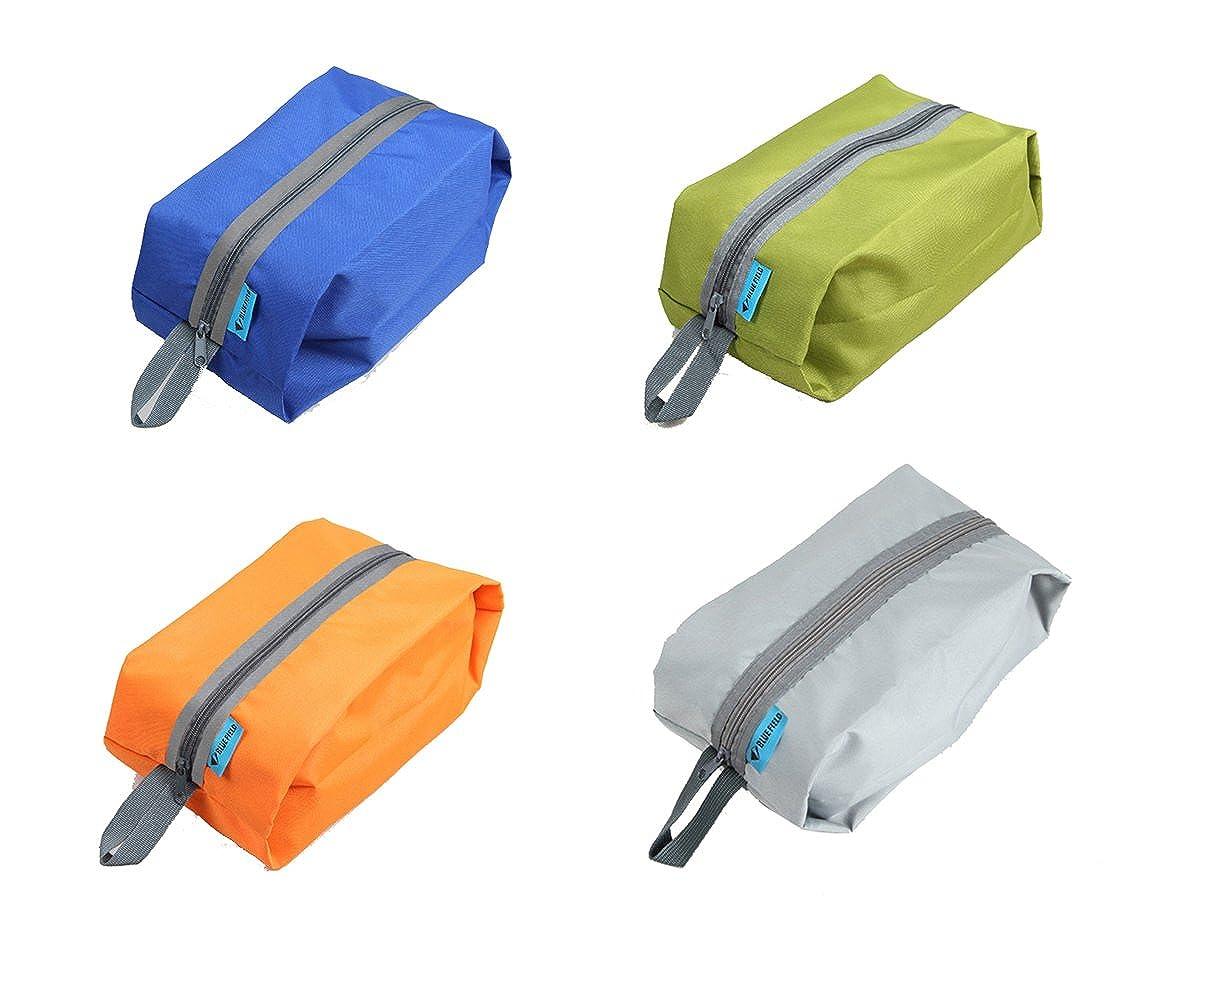 Tumecos Large Waterproof Portable Travel Organizer Toiletry Dopp Kit Shoe Bag Pouch